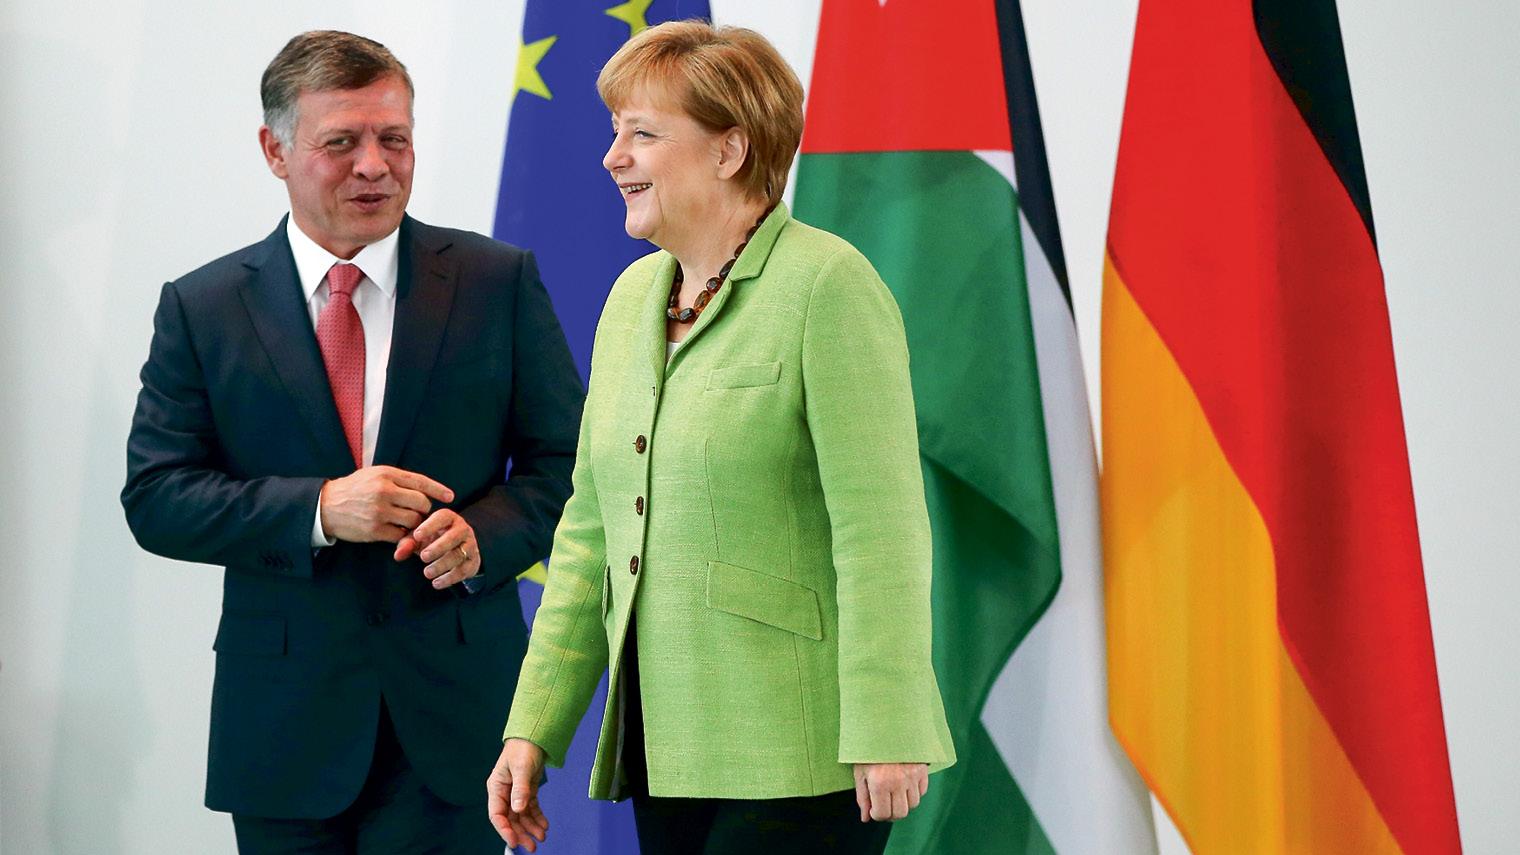 King Abdullah II with German chancellor Angela Merkel at a meeting in June 2014